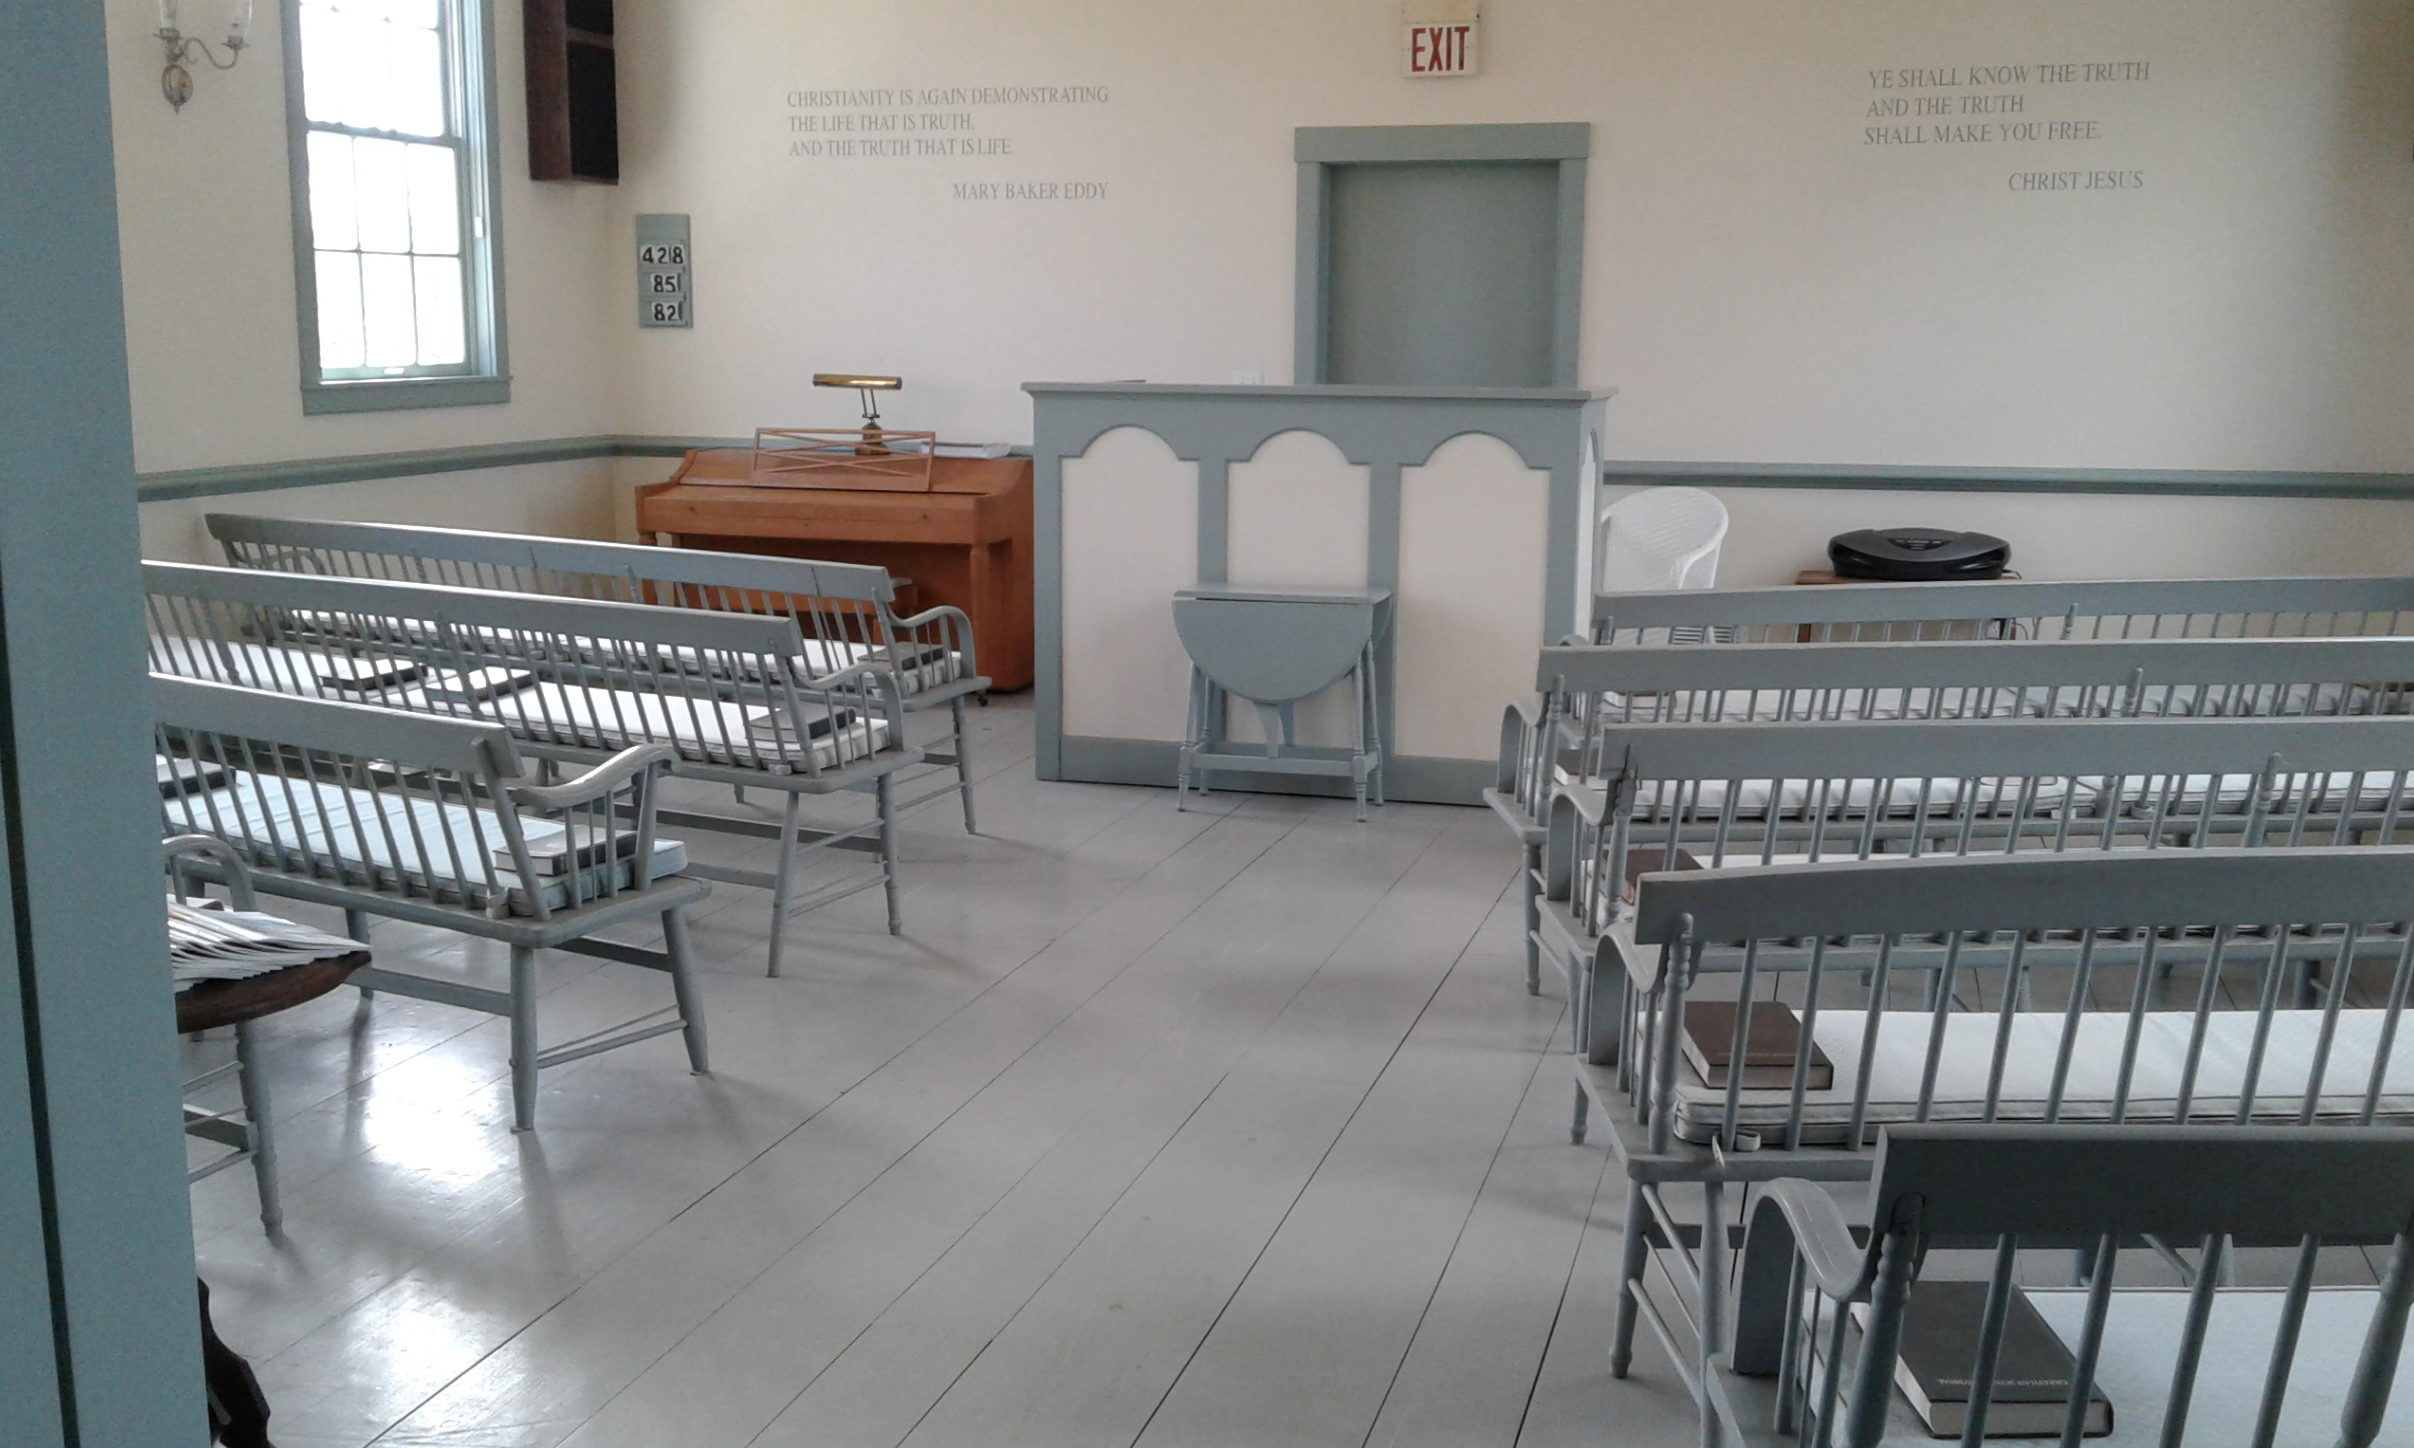 Christian-Science-Society-Nantucket.png